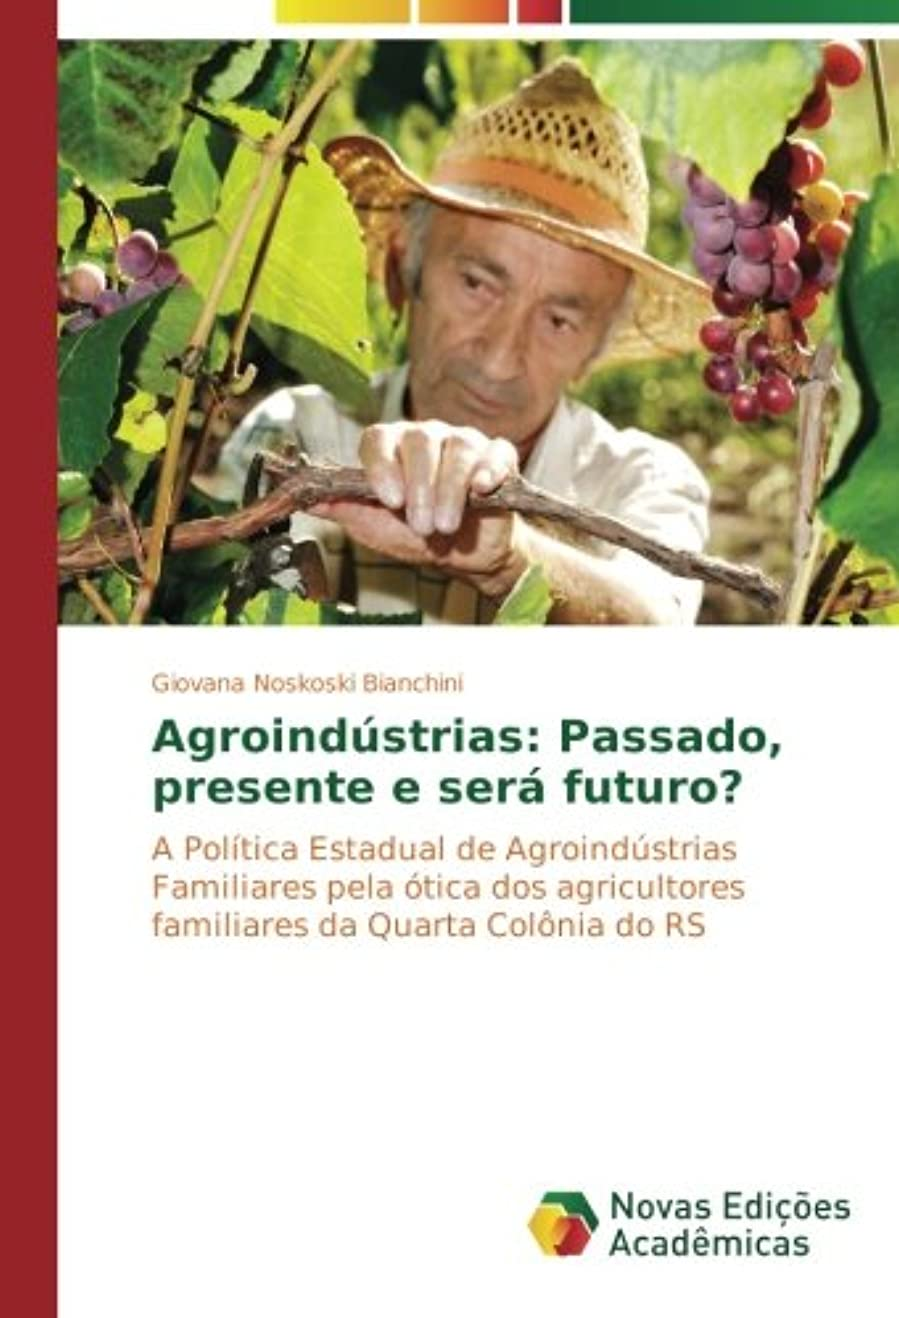 戸惑う前進不均一Agroindústrias: Passado, presente e será futuro?: A Política Estadual de Agroindústrias Familiares pela ótica dos agricultores familiares da Quarta Col?nia do RS